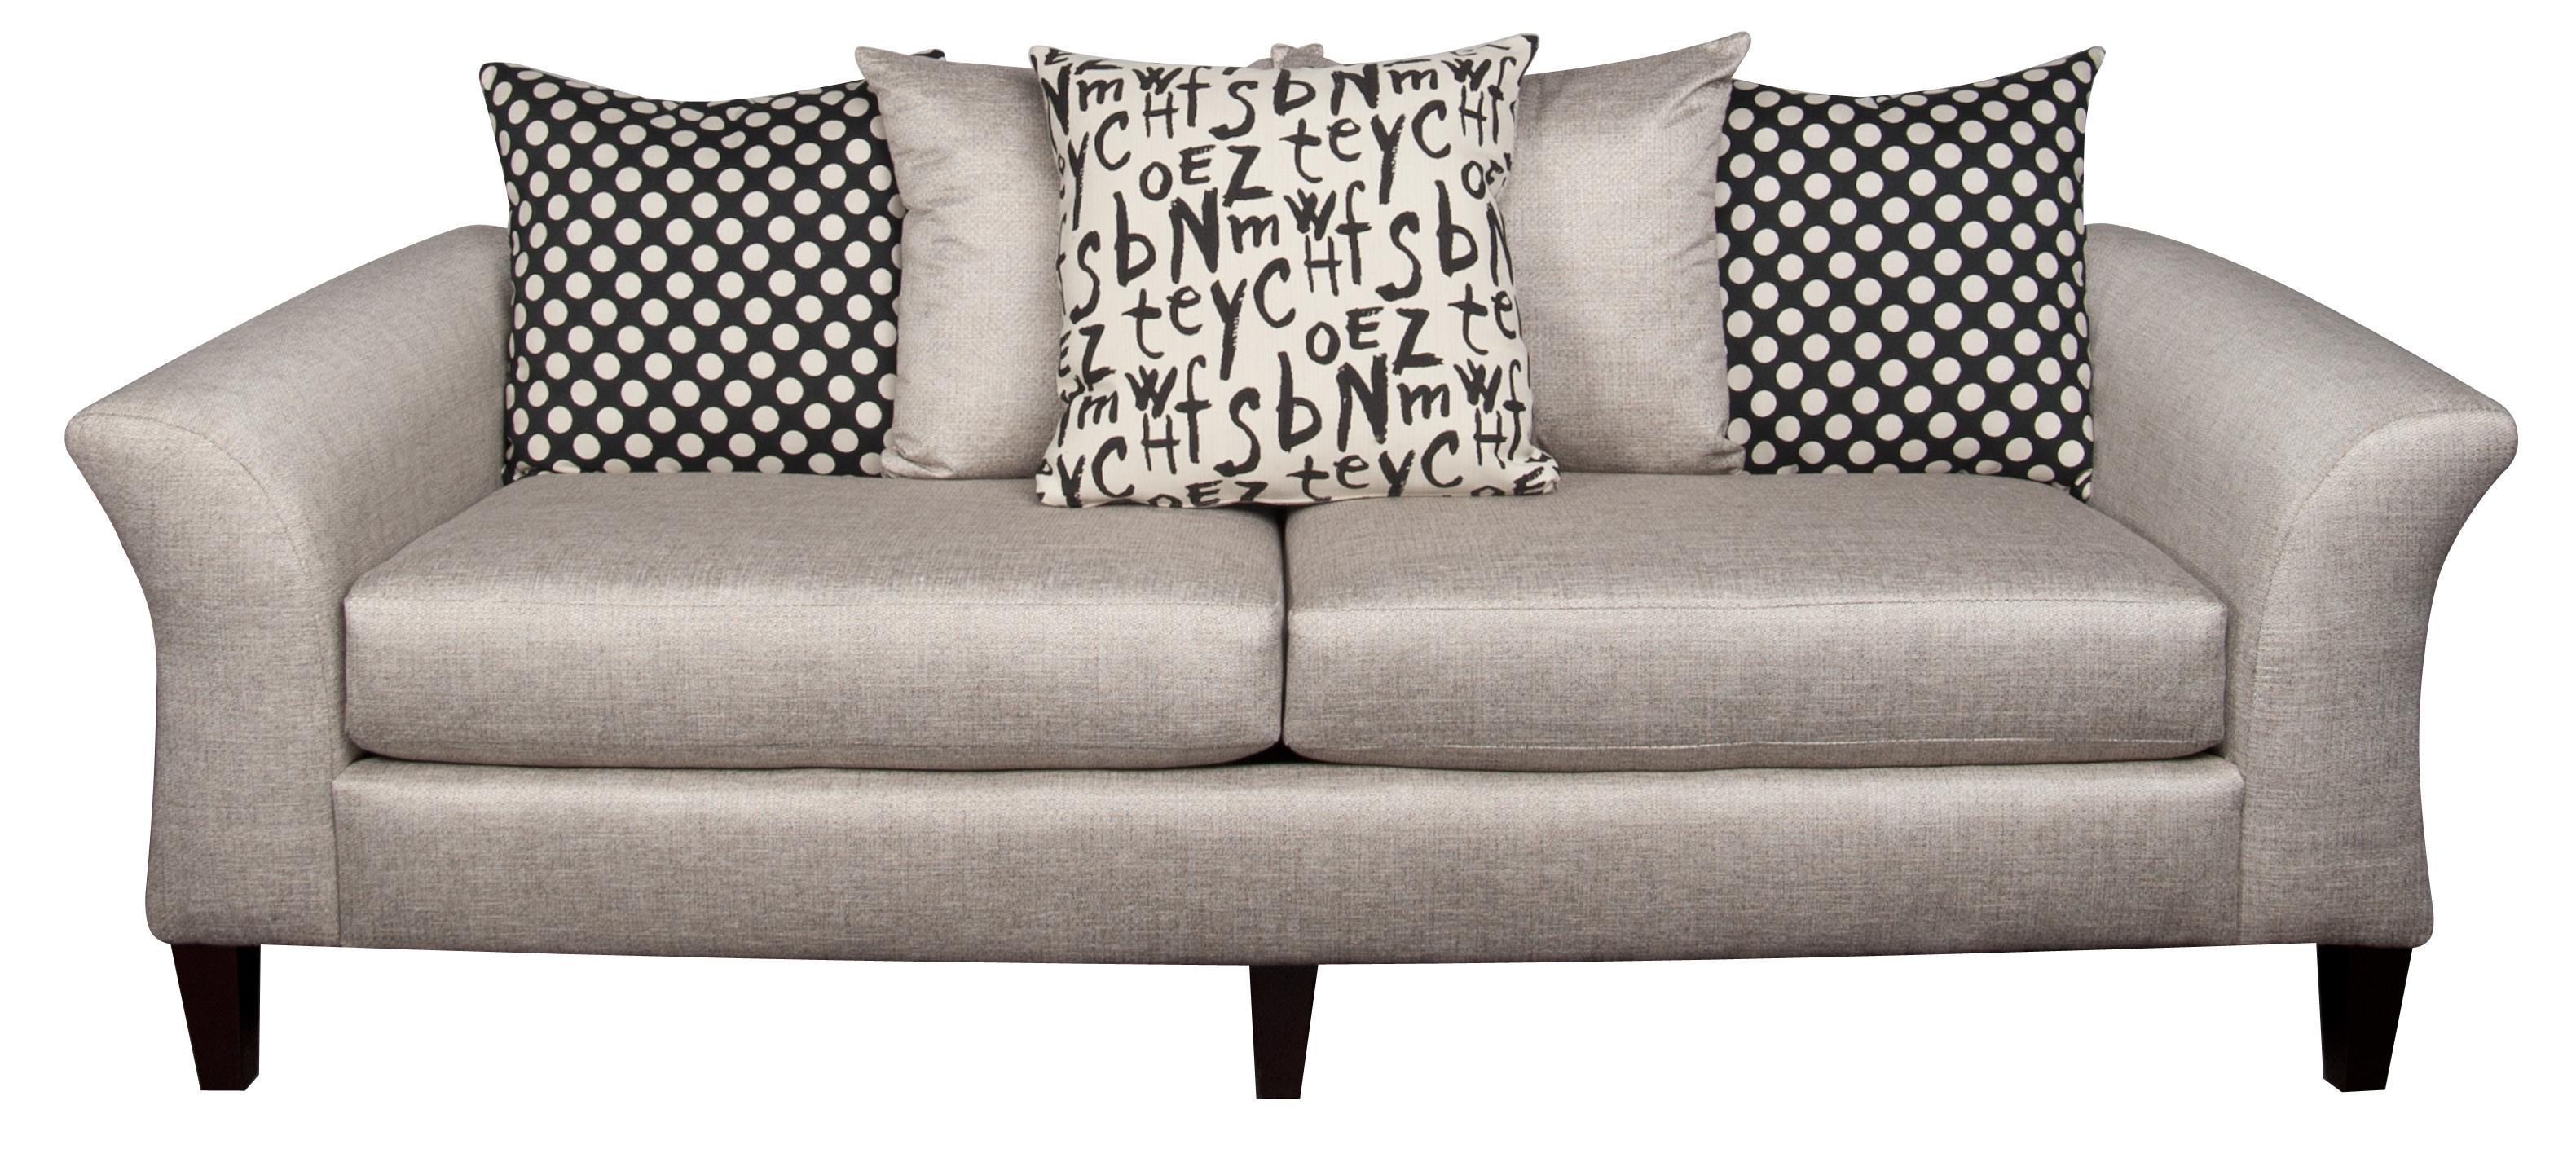 Morris Home Furnishings Jamie Jamie Sofa - Item Number: 132644918